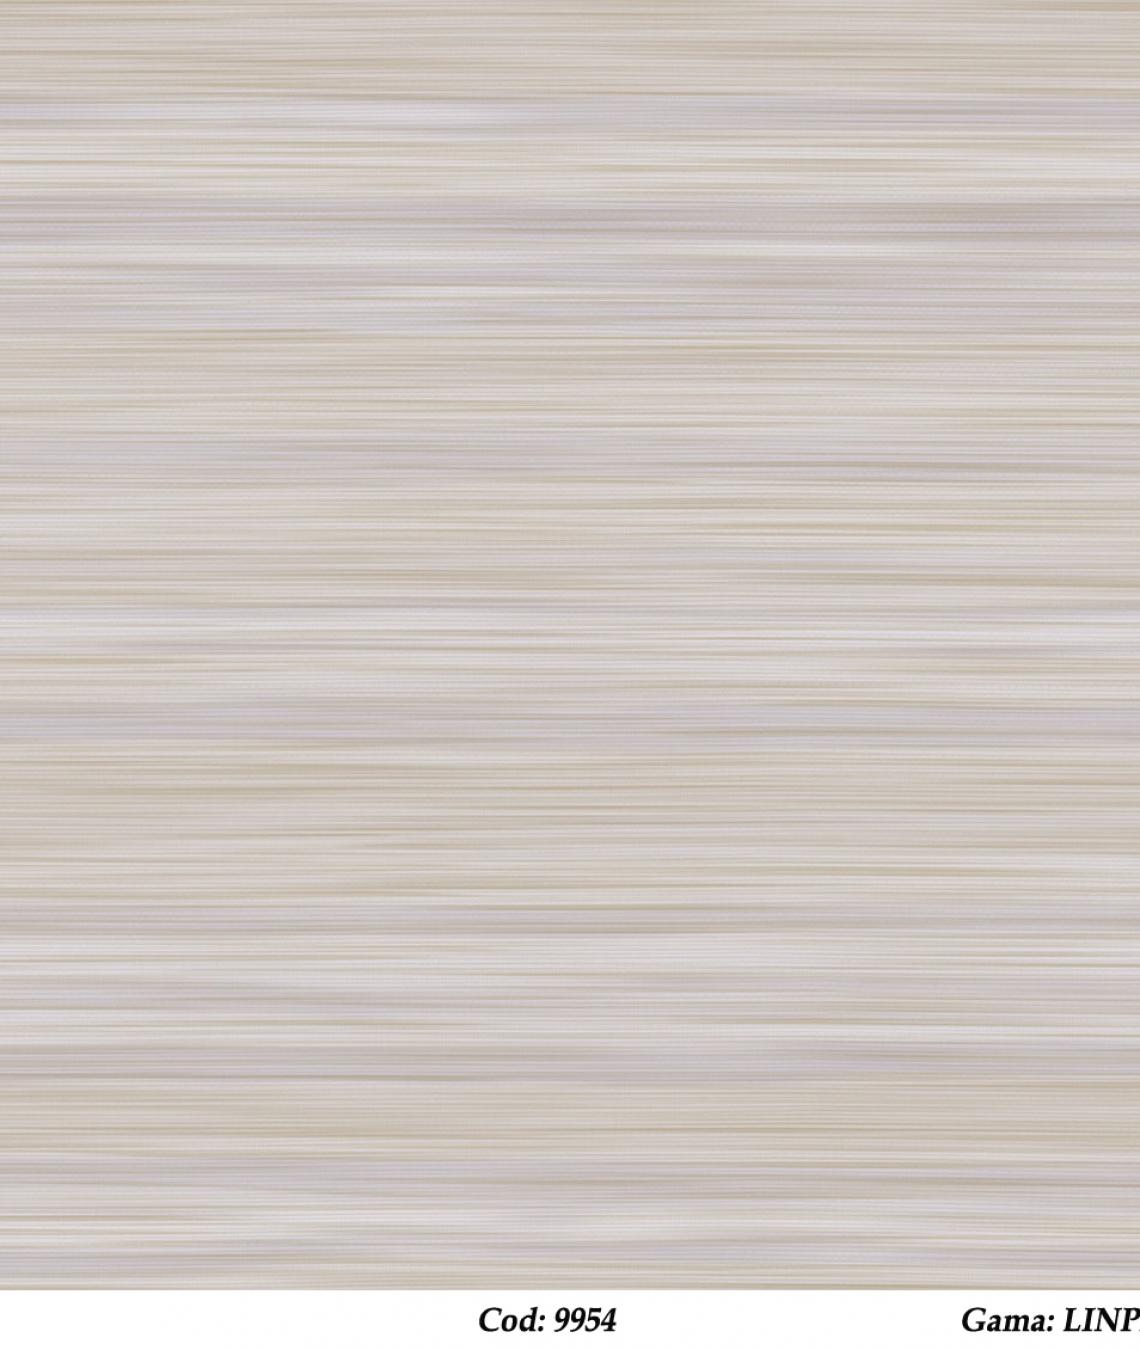 tapet-cu-dungi-orizontale-cod-9954-gama-linpha